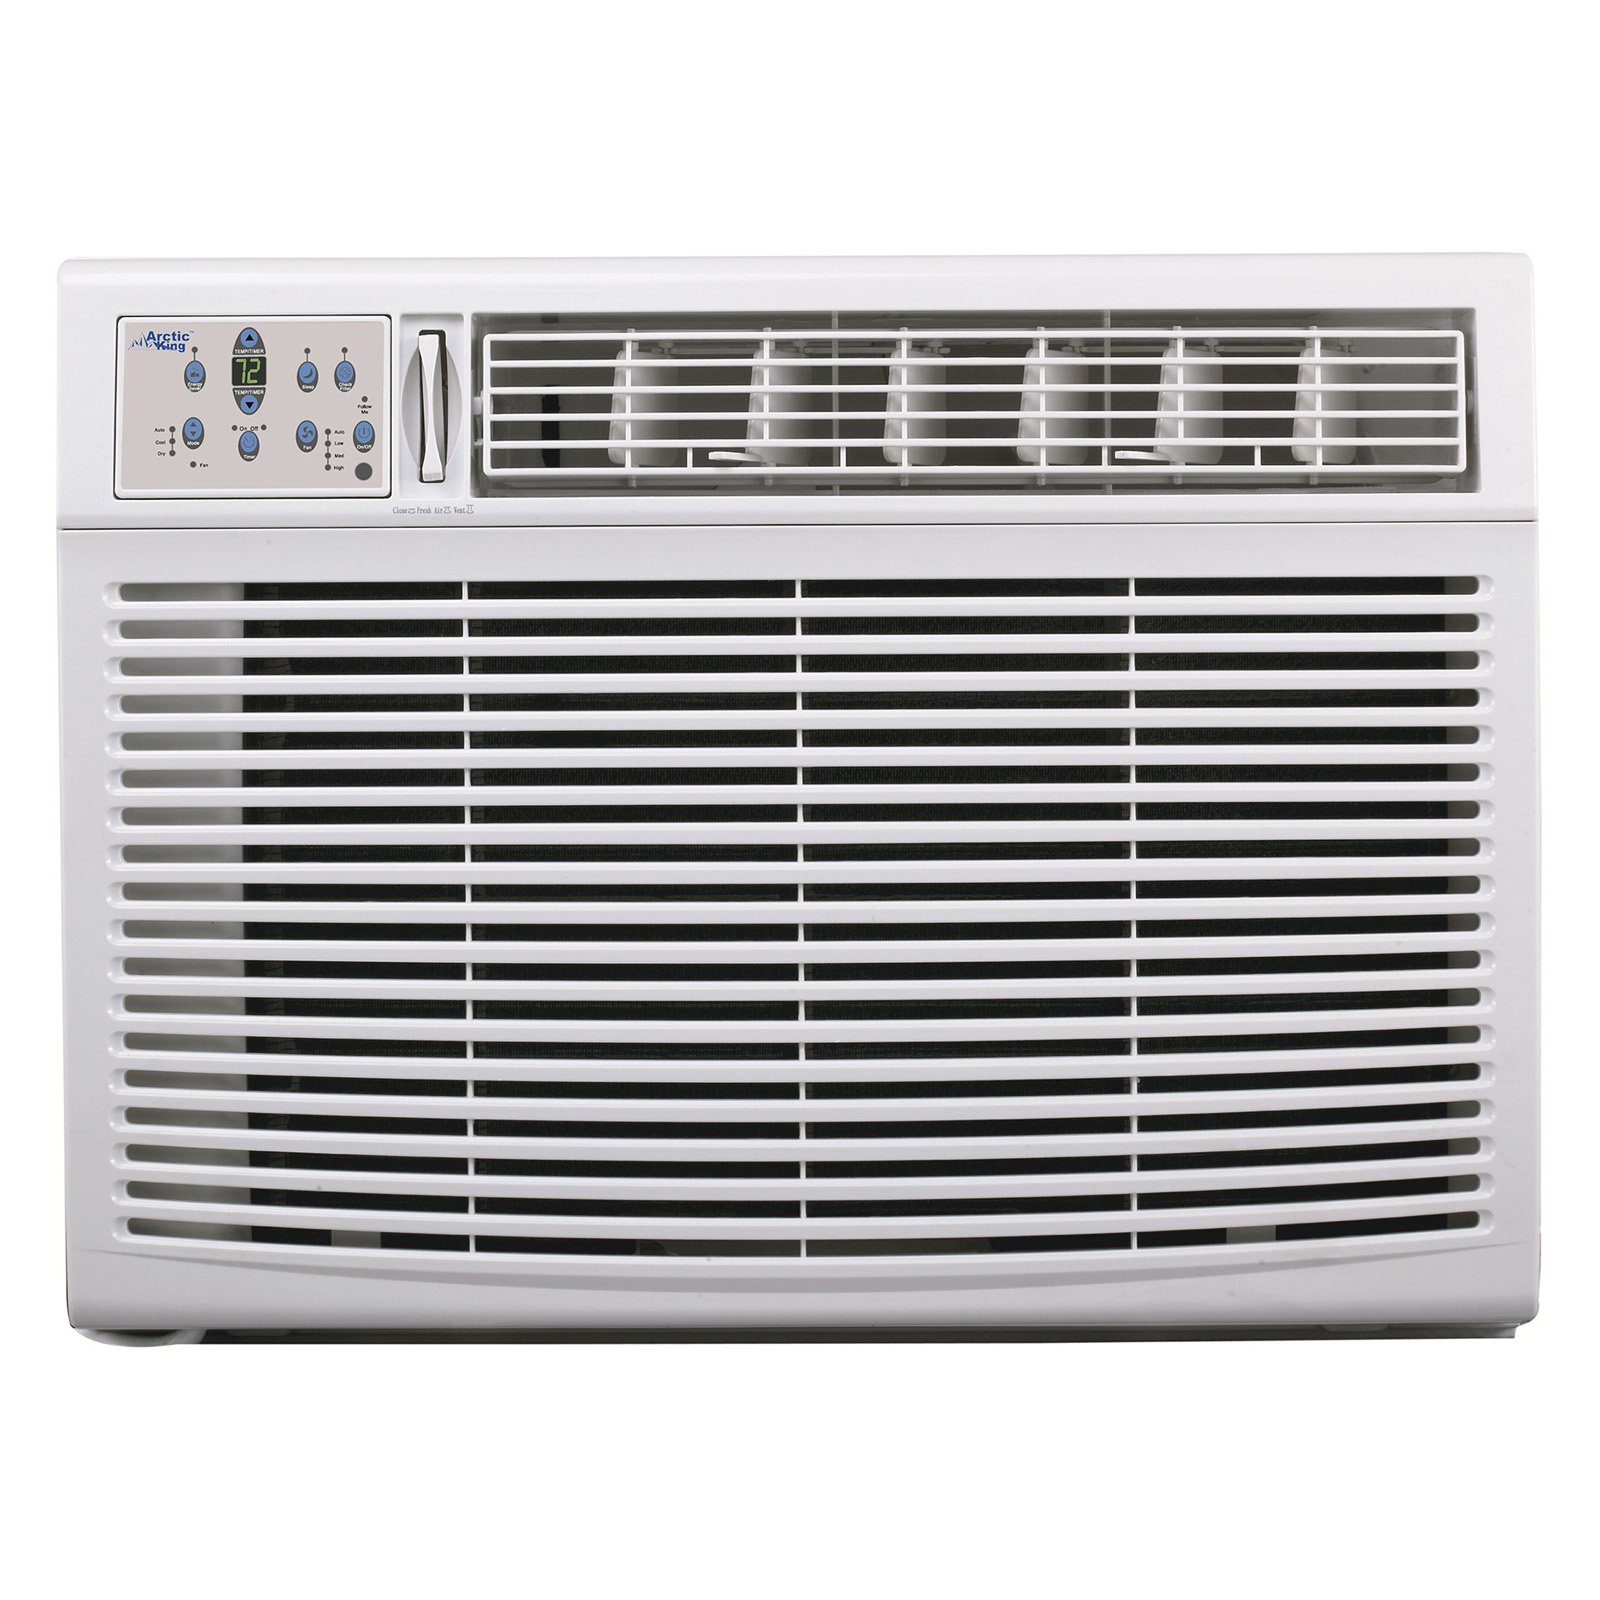 arctic king 25k 208v window air conditioner-heater - walmart